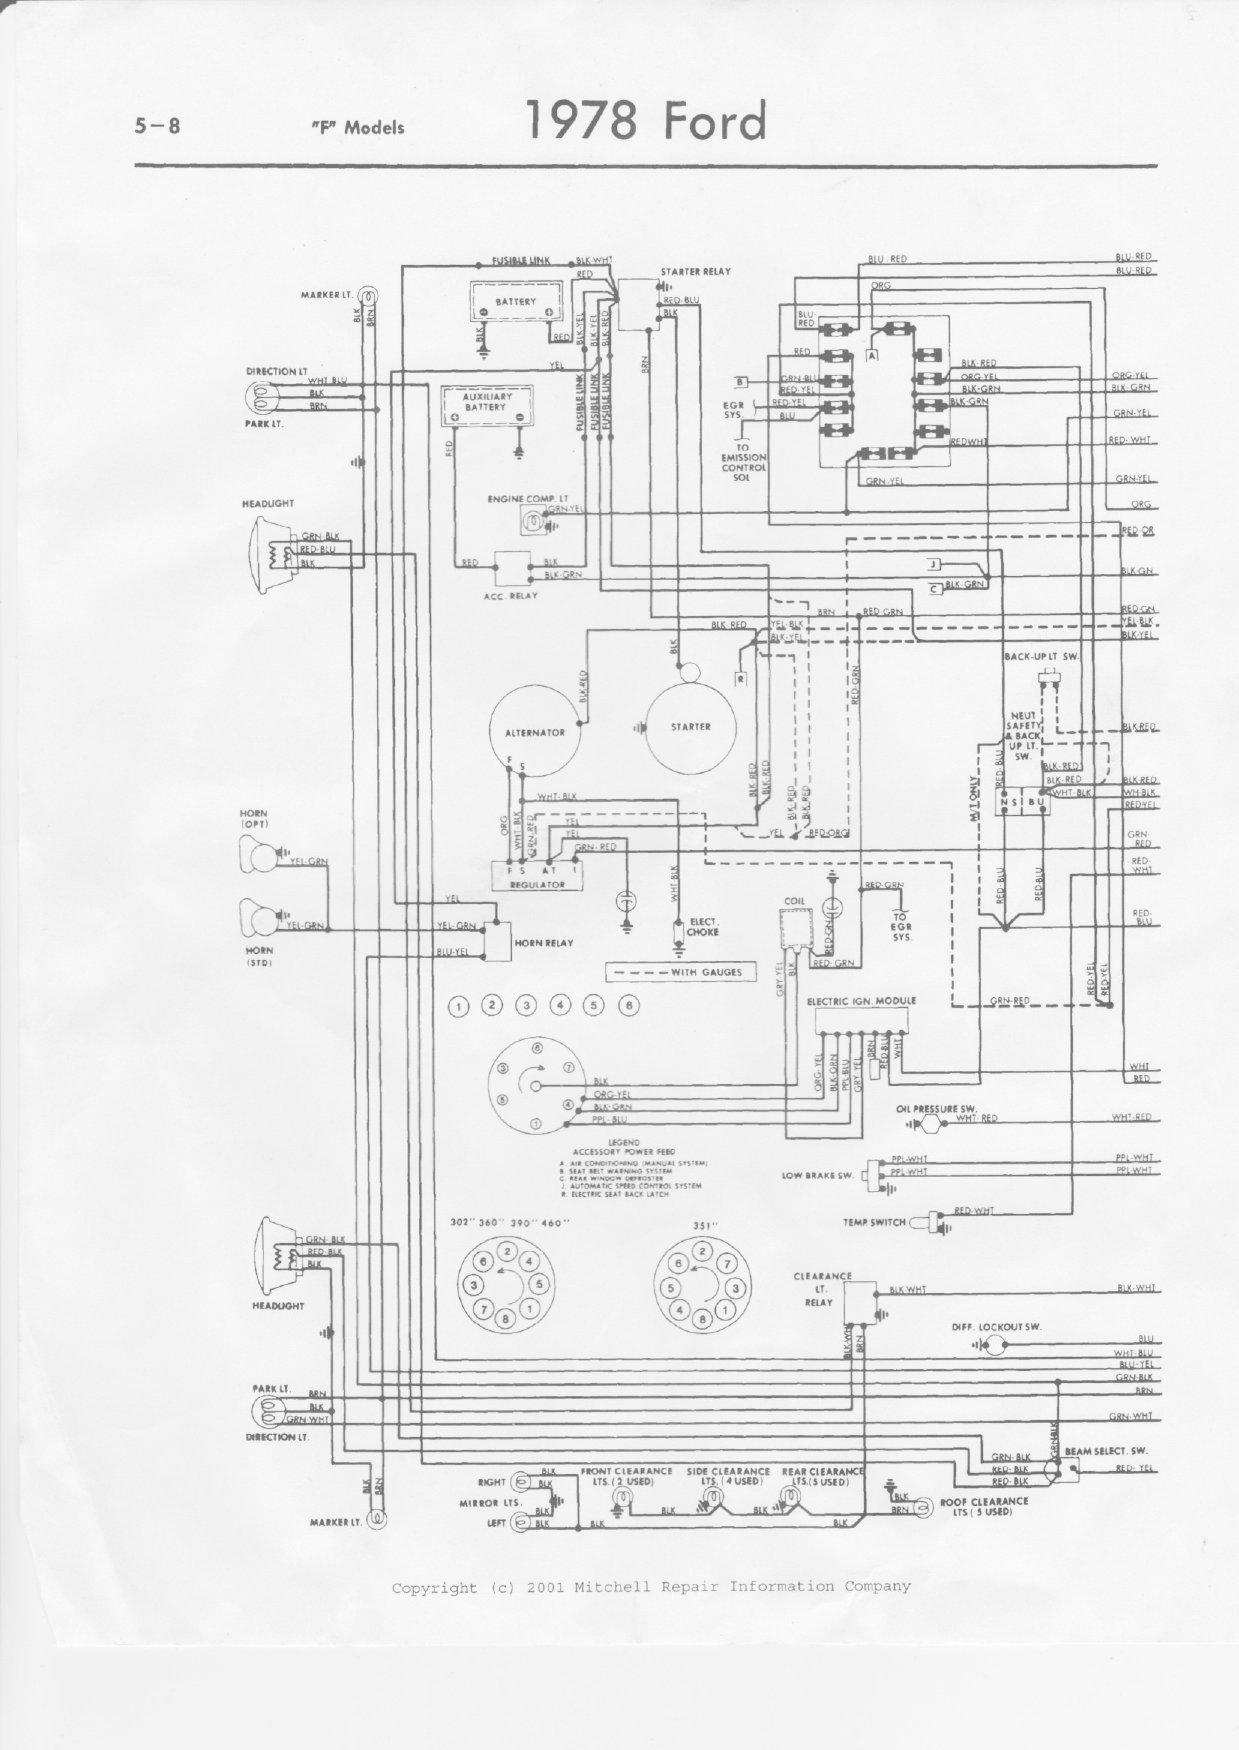 1978 Headlight Wiring Diagram